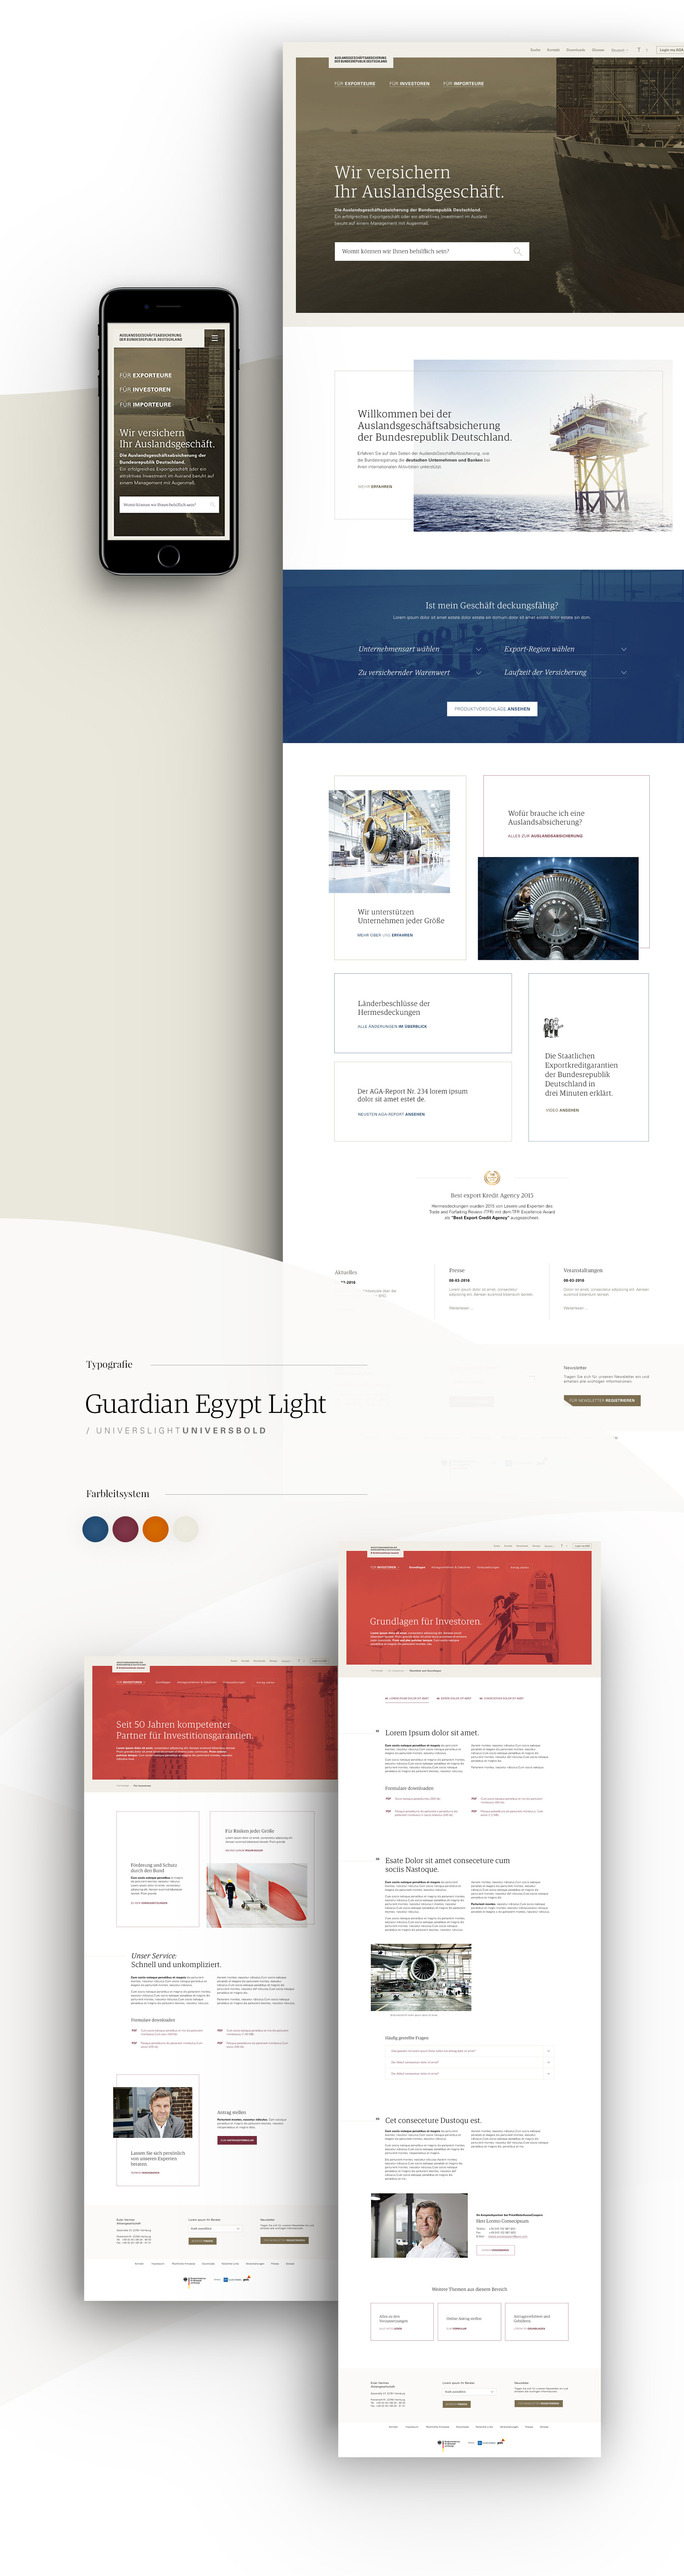 julia-kestner-projekt-design-aga-portal